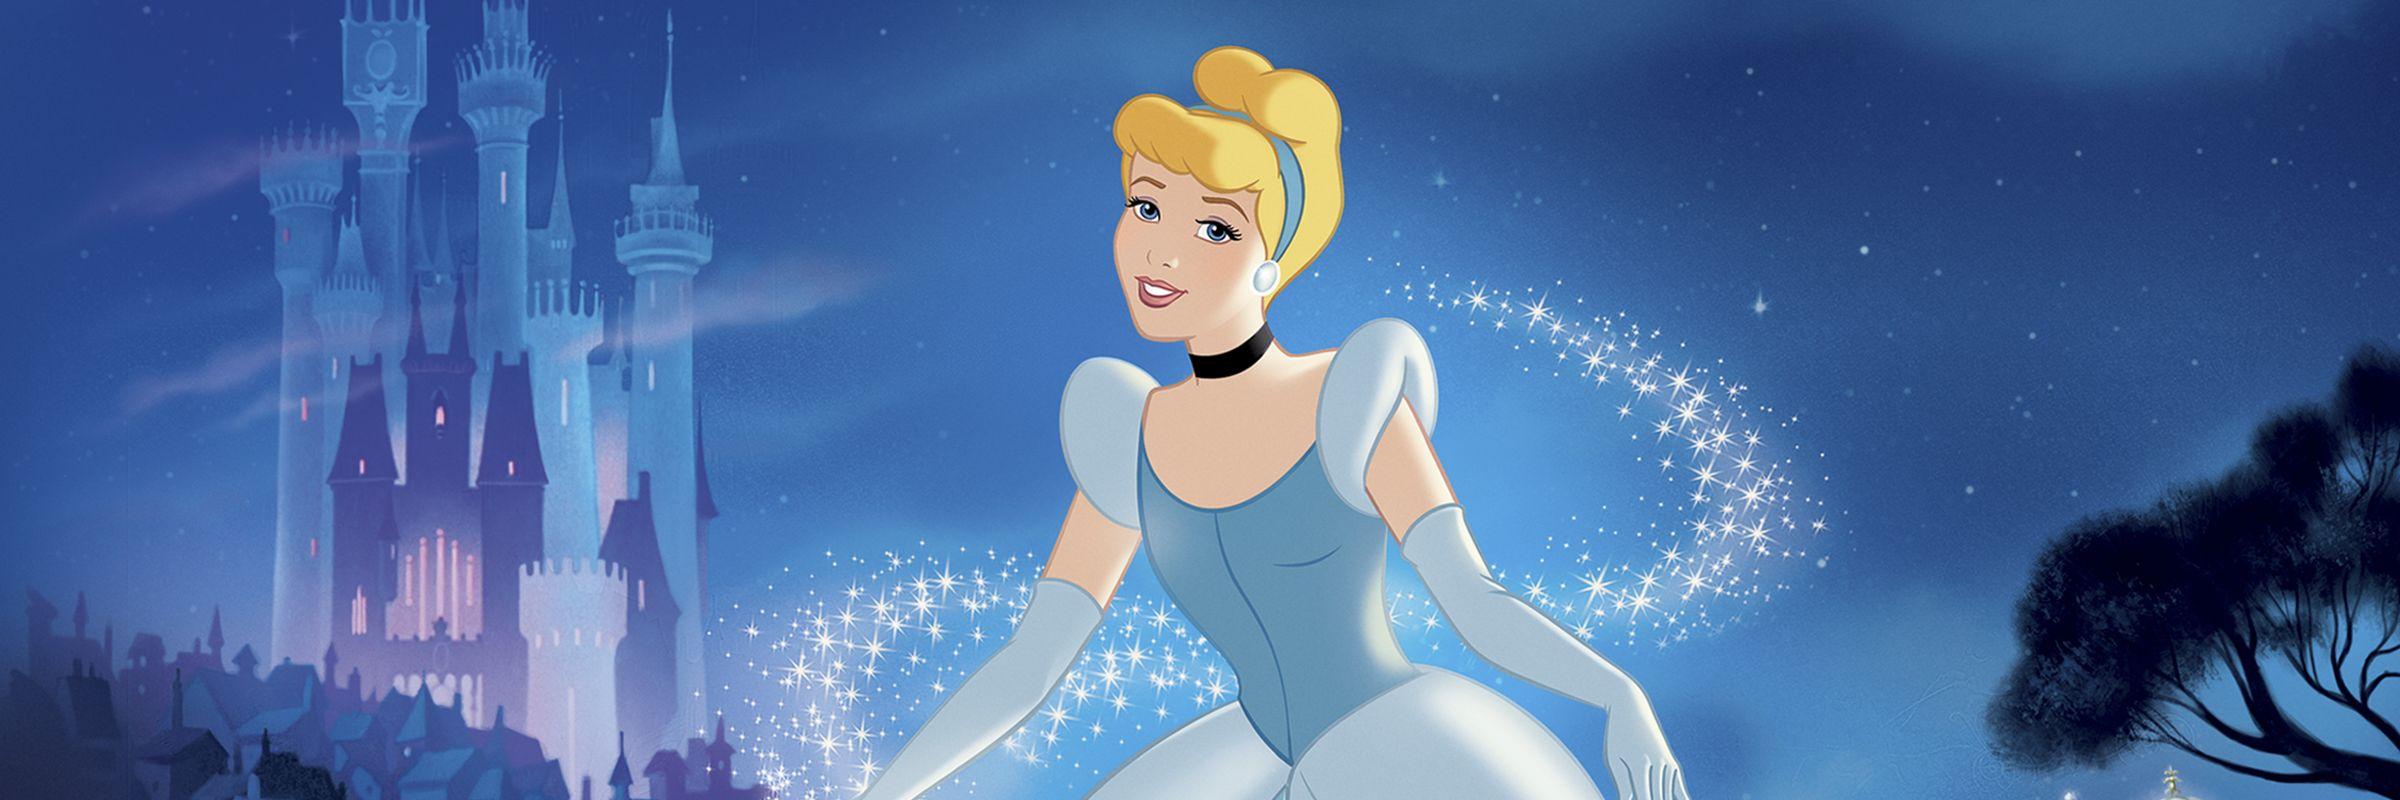 Cinderella | Full Movie | Movies Anywhere